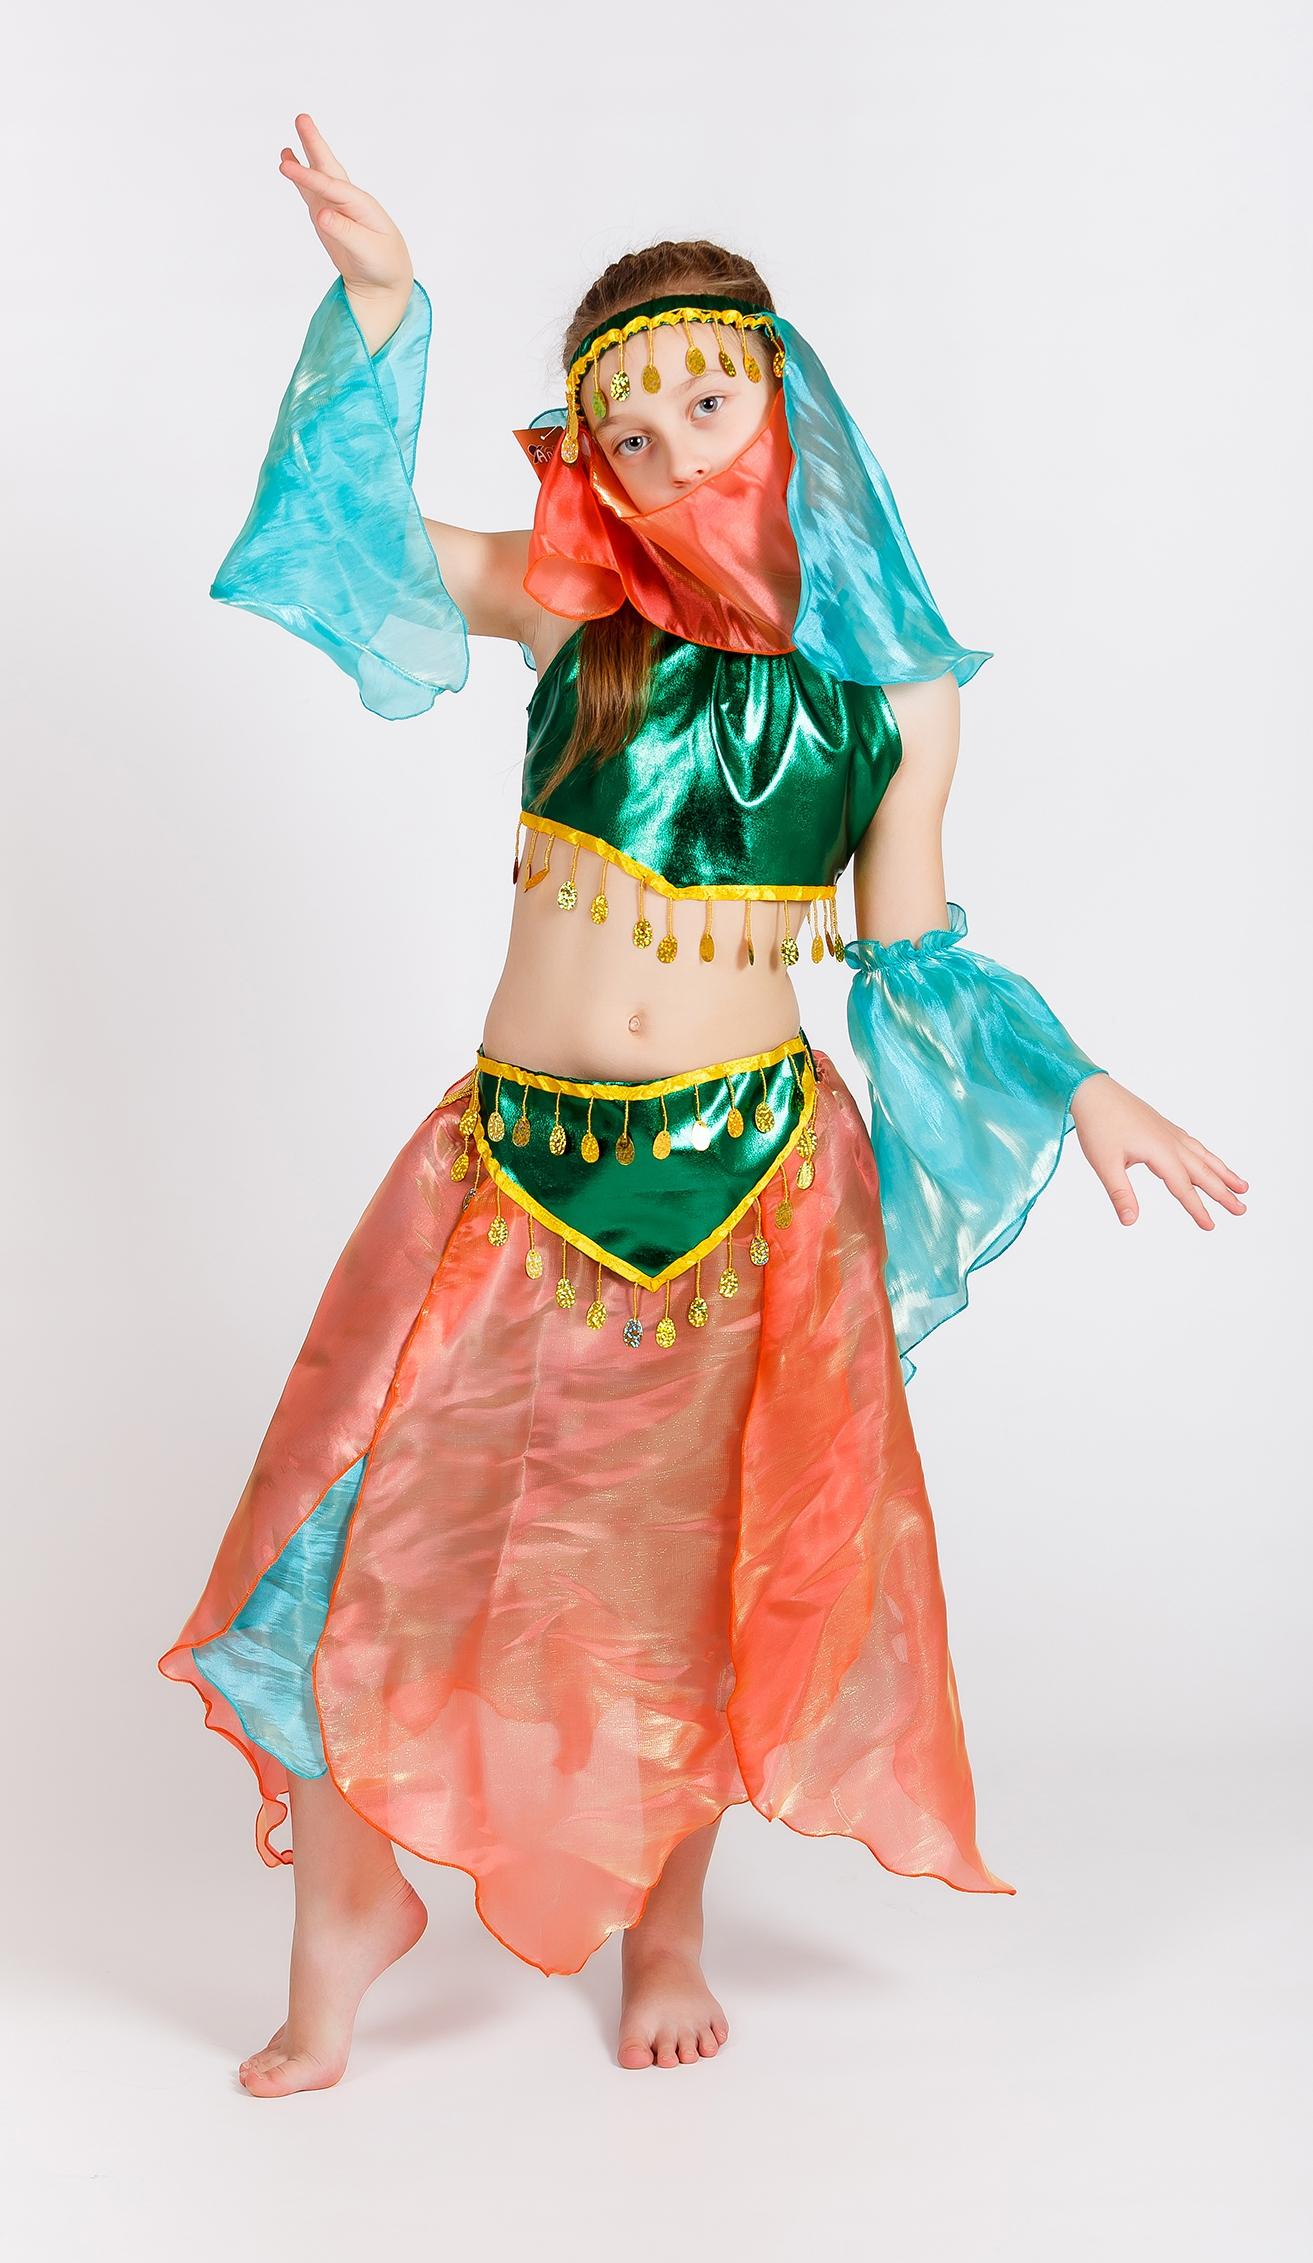 Изумрудный костюм Шахерезады (32) костюм для танцев в спб